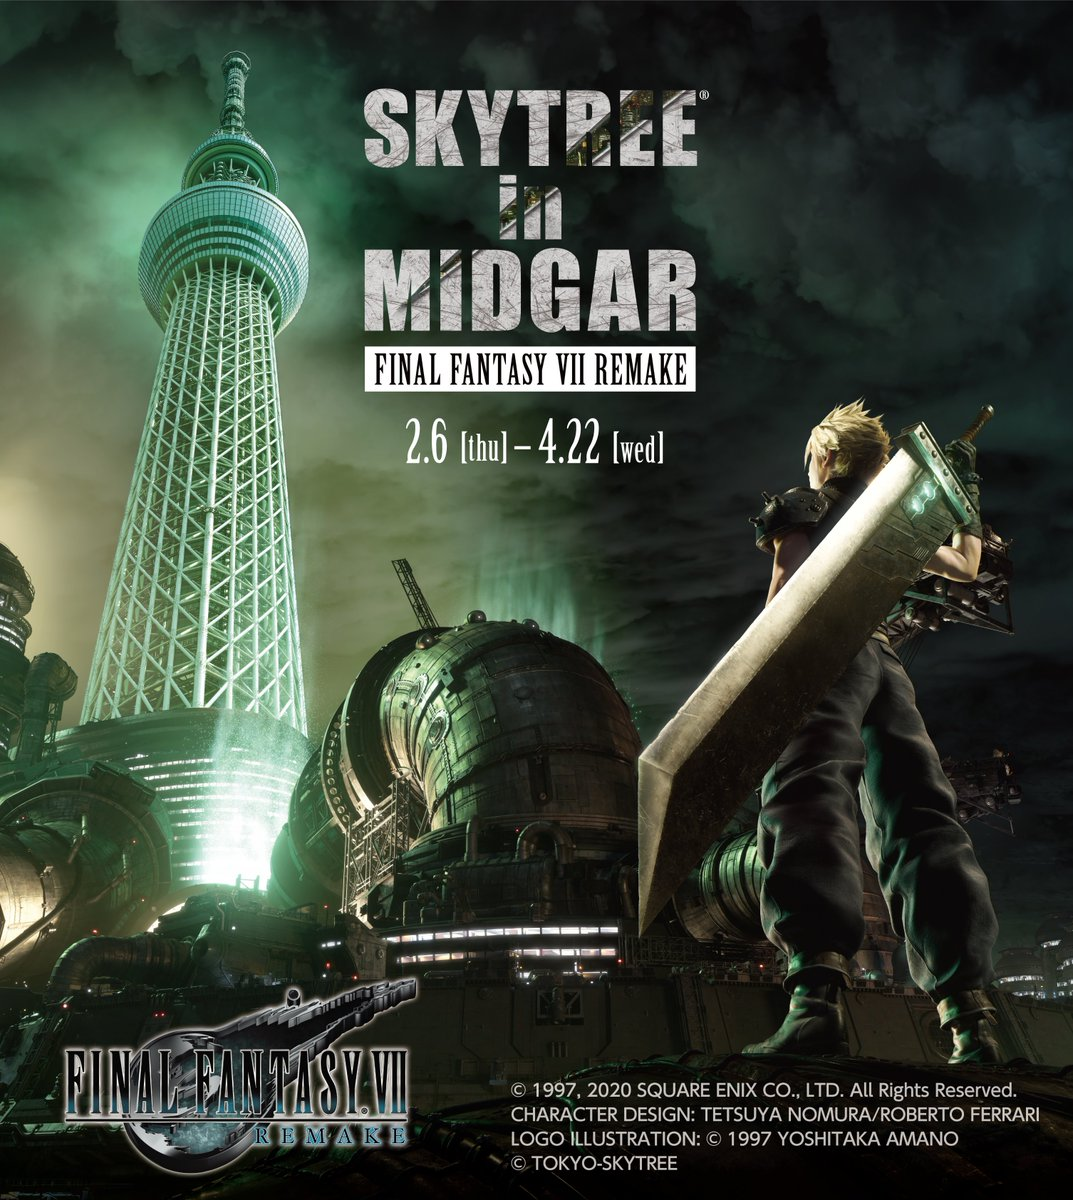 『FINAL FANTASY Ⅶ REMAKE』発売記念コラボイベント『SKYTREE® in MIDGAR FINAL FANTASY Ⅶ REMAKE』開催決定!🎉✨▽詳細▽最新情報は公式HPや公式Twitterにて随時更新いたします!#スカイツリー #skytree #東京スカイツリー #FF7R